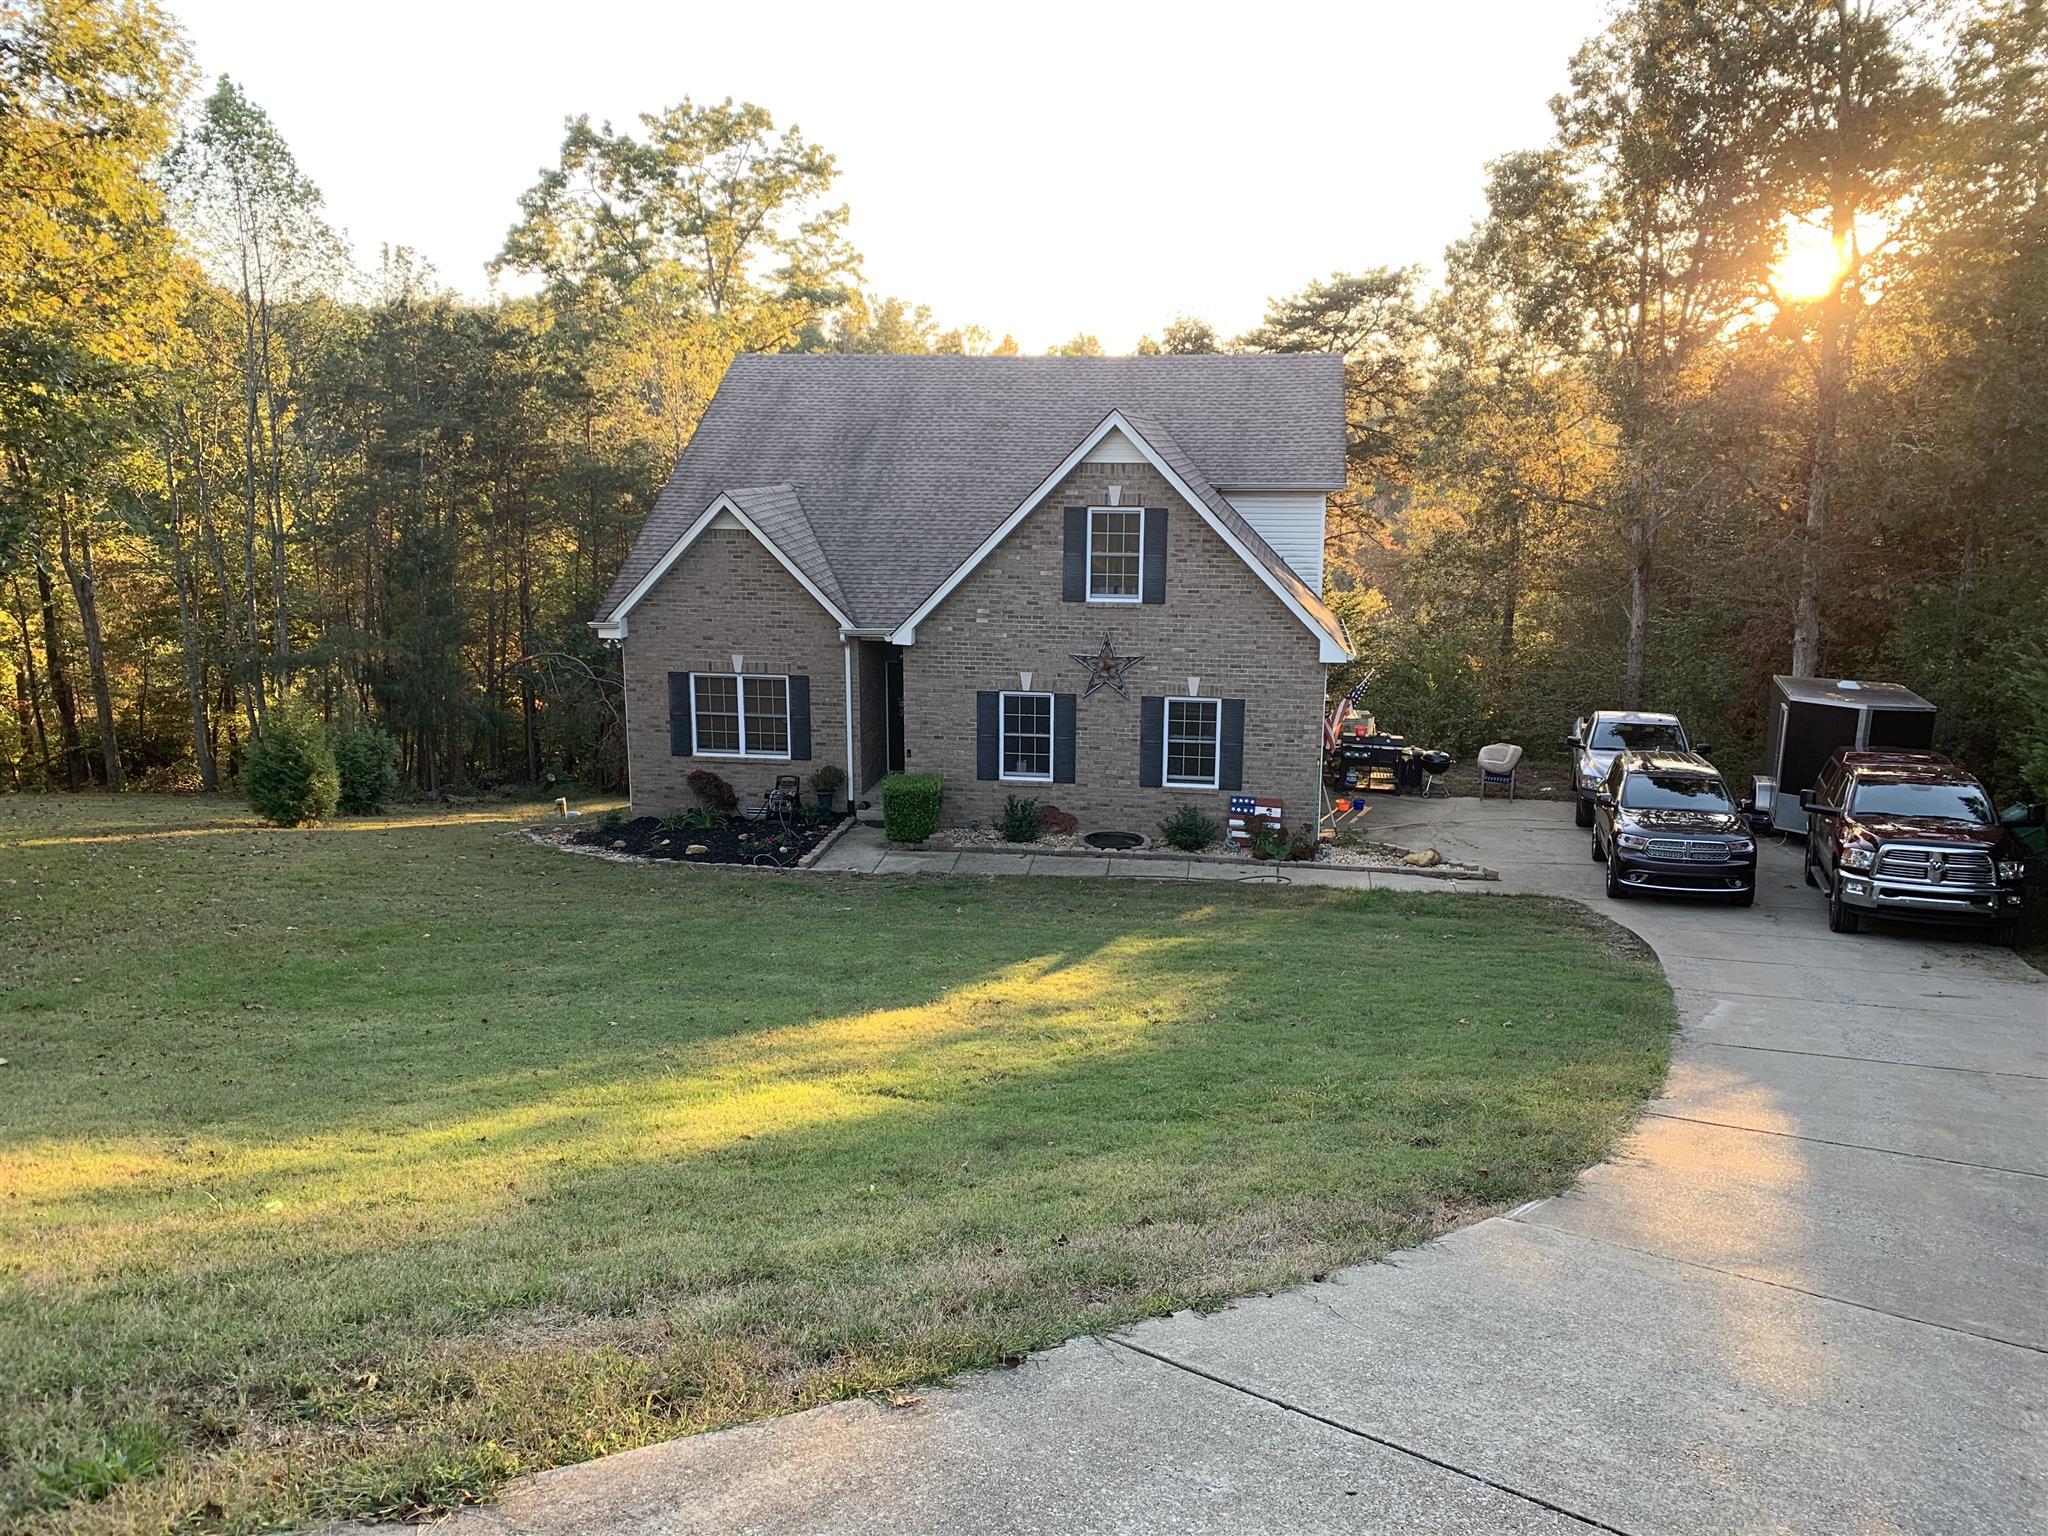 1312 Teri Lynn Ct, Kingston Springs, TN 37082 - Kingston Springs, TN real estate listing